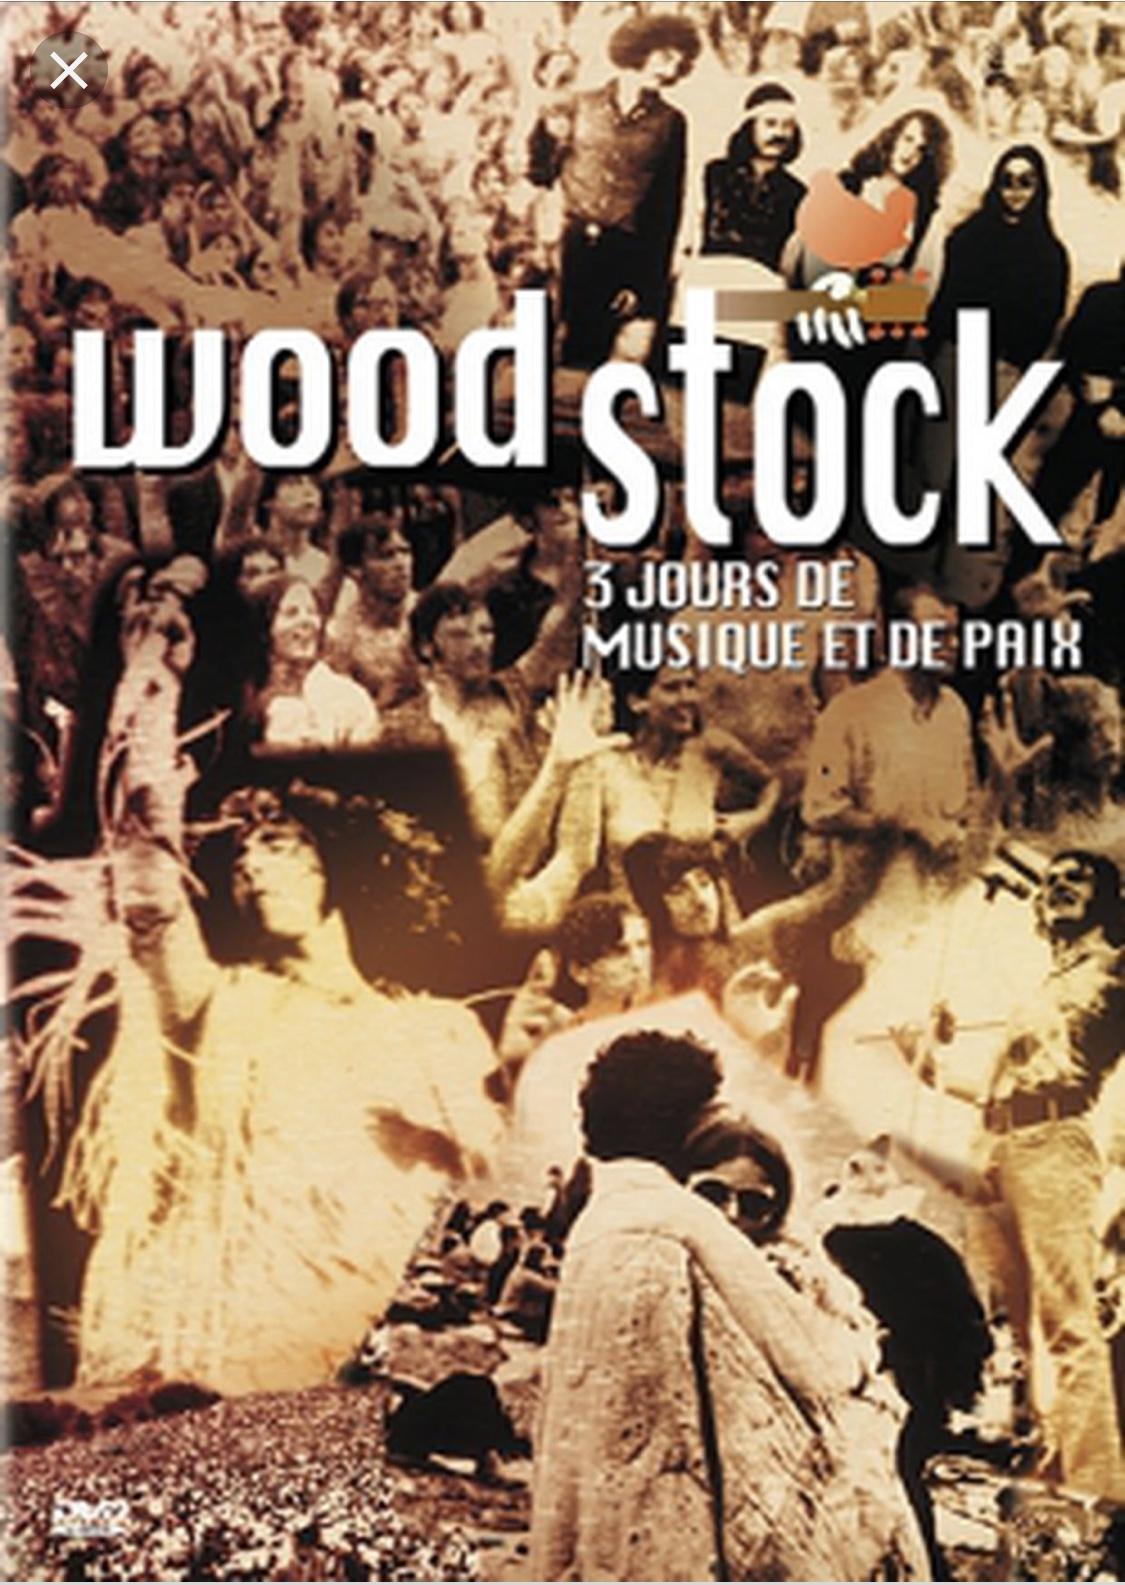 Woodstock – 50 ans ça se fête, à L'isula